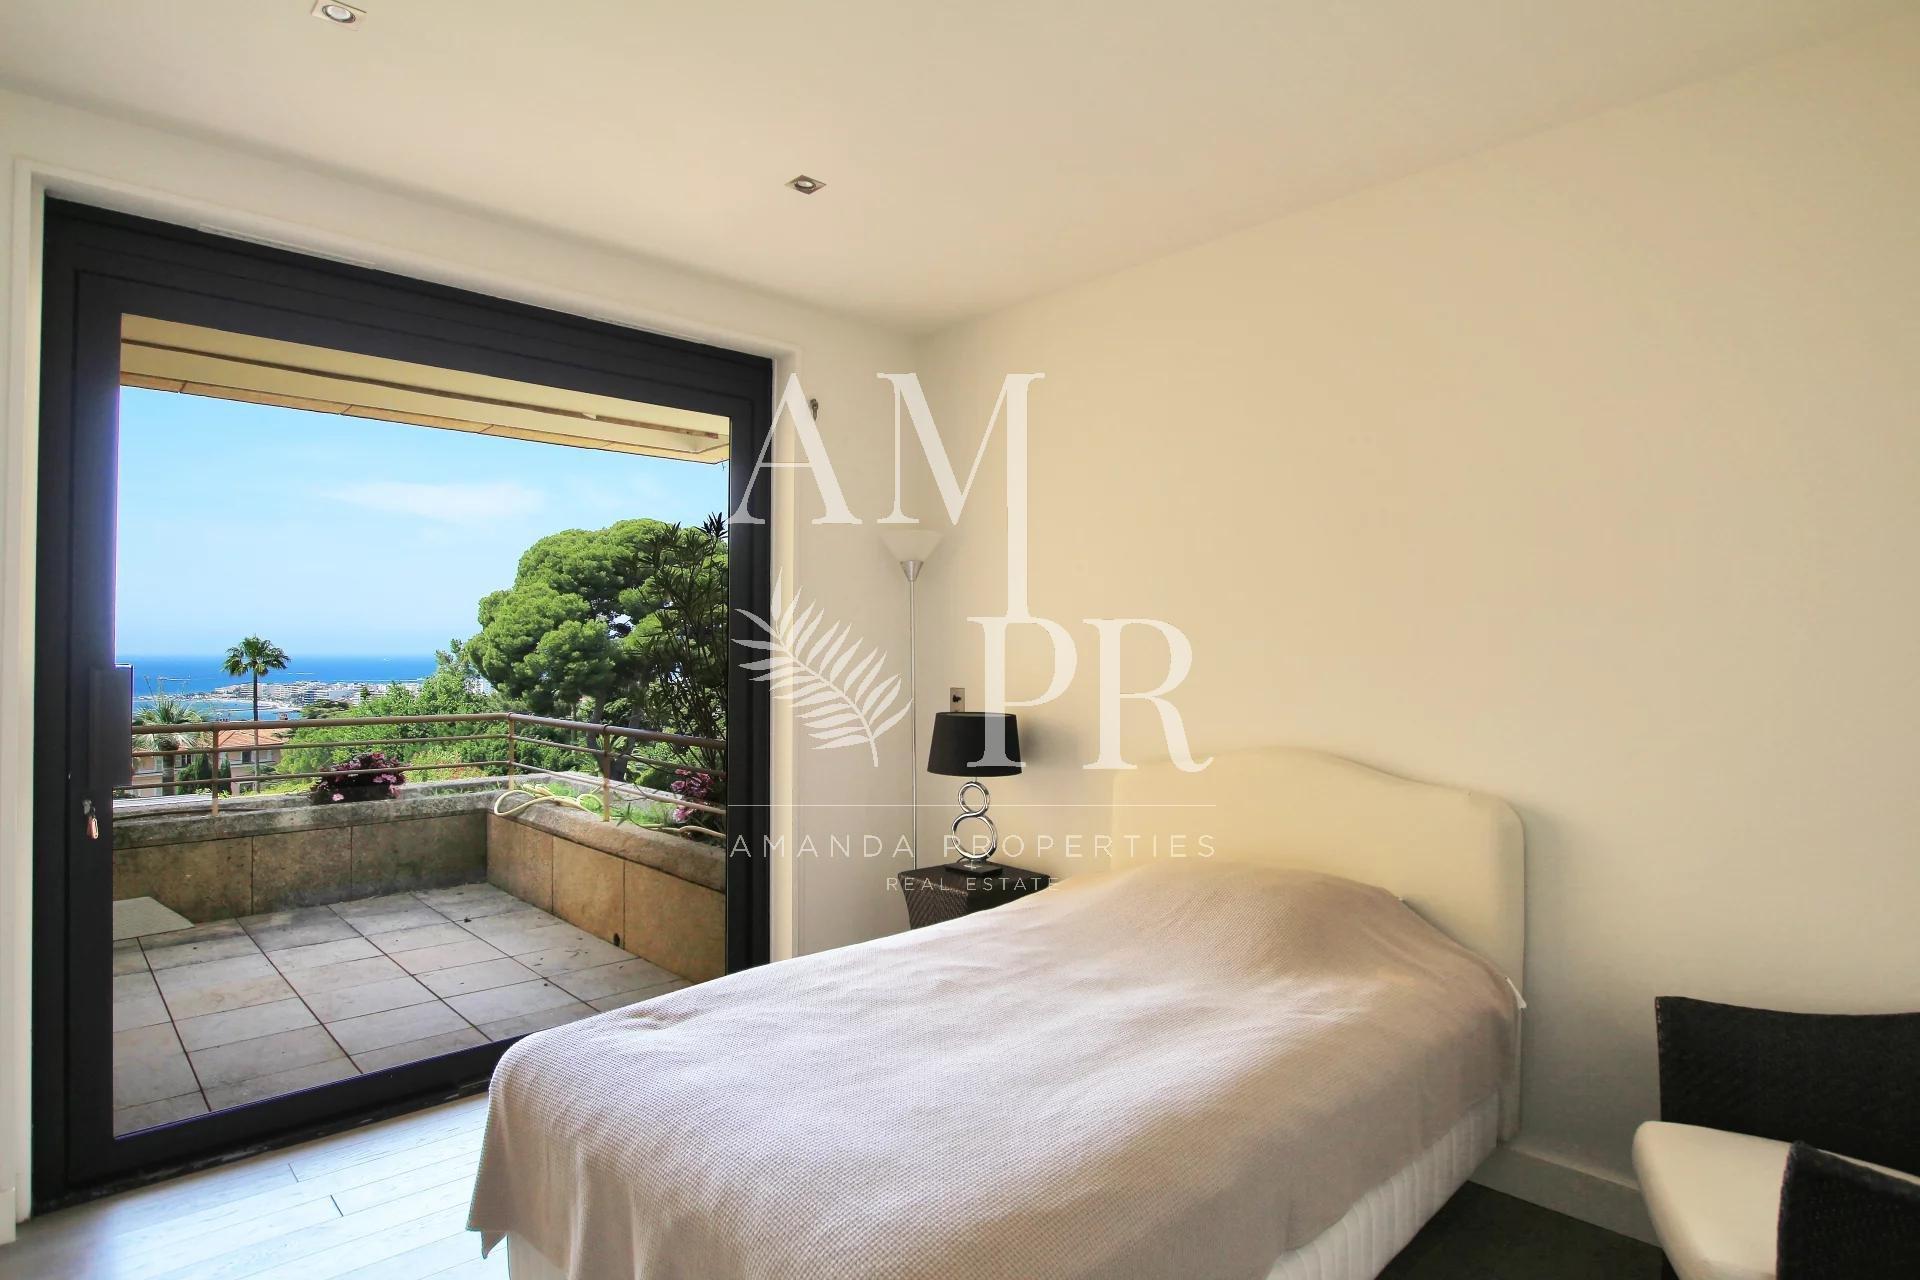 Cannes Californie - Luxueux appartement